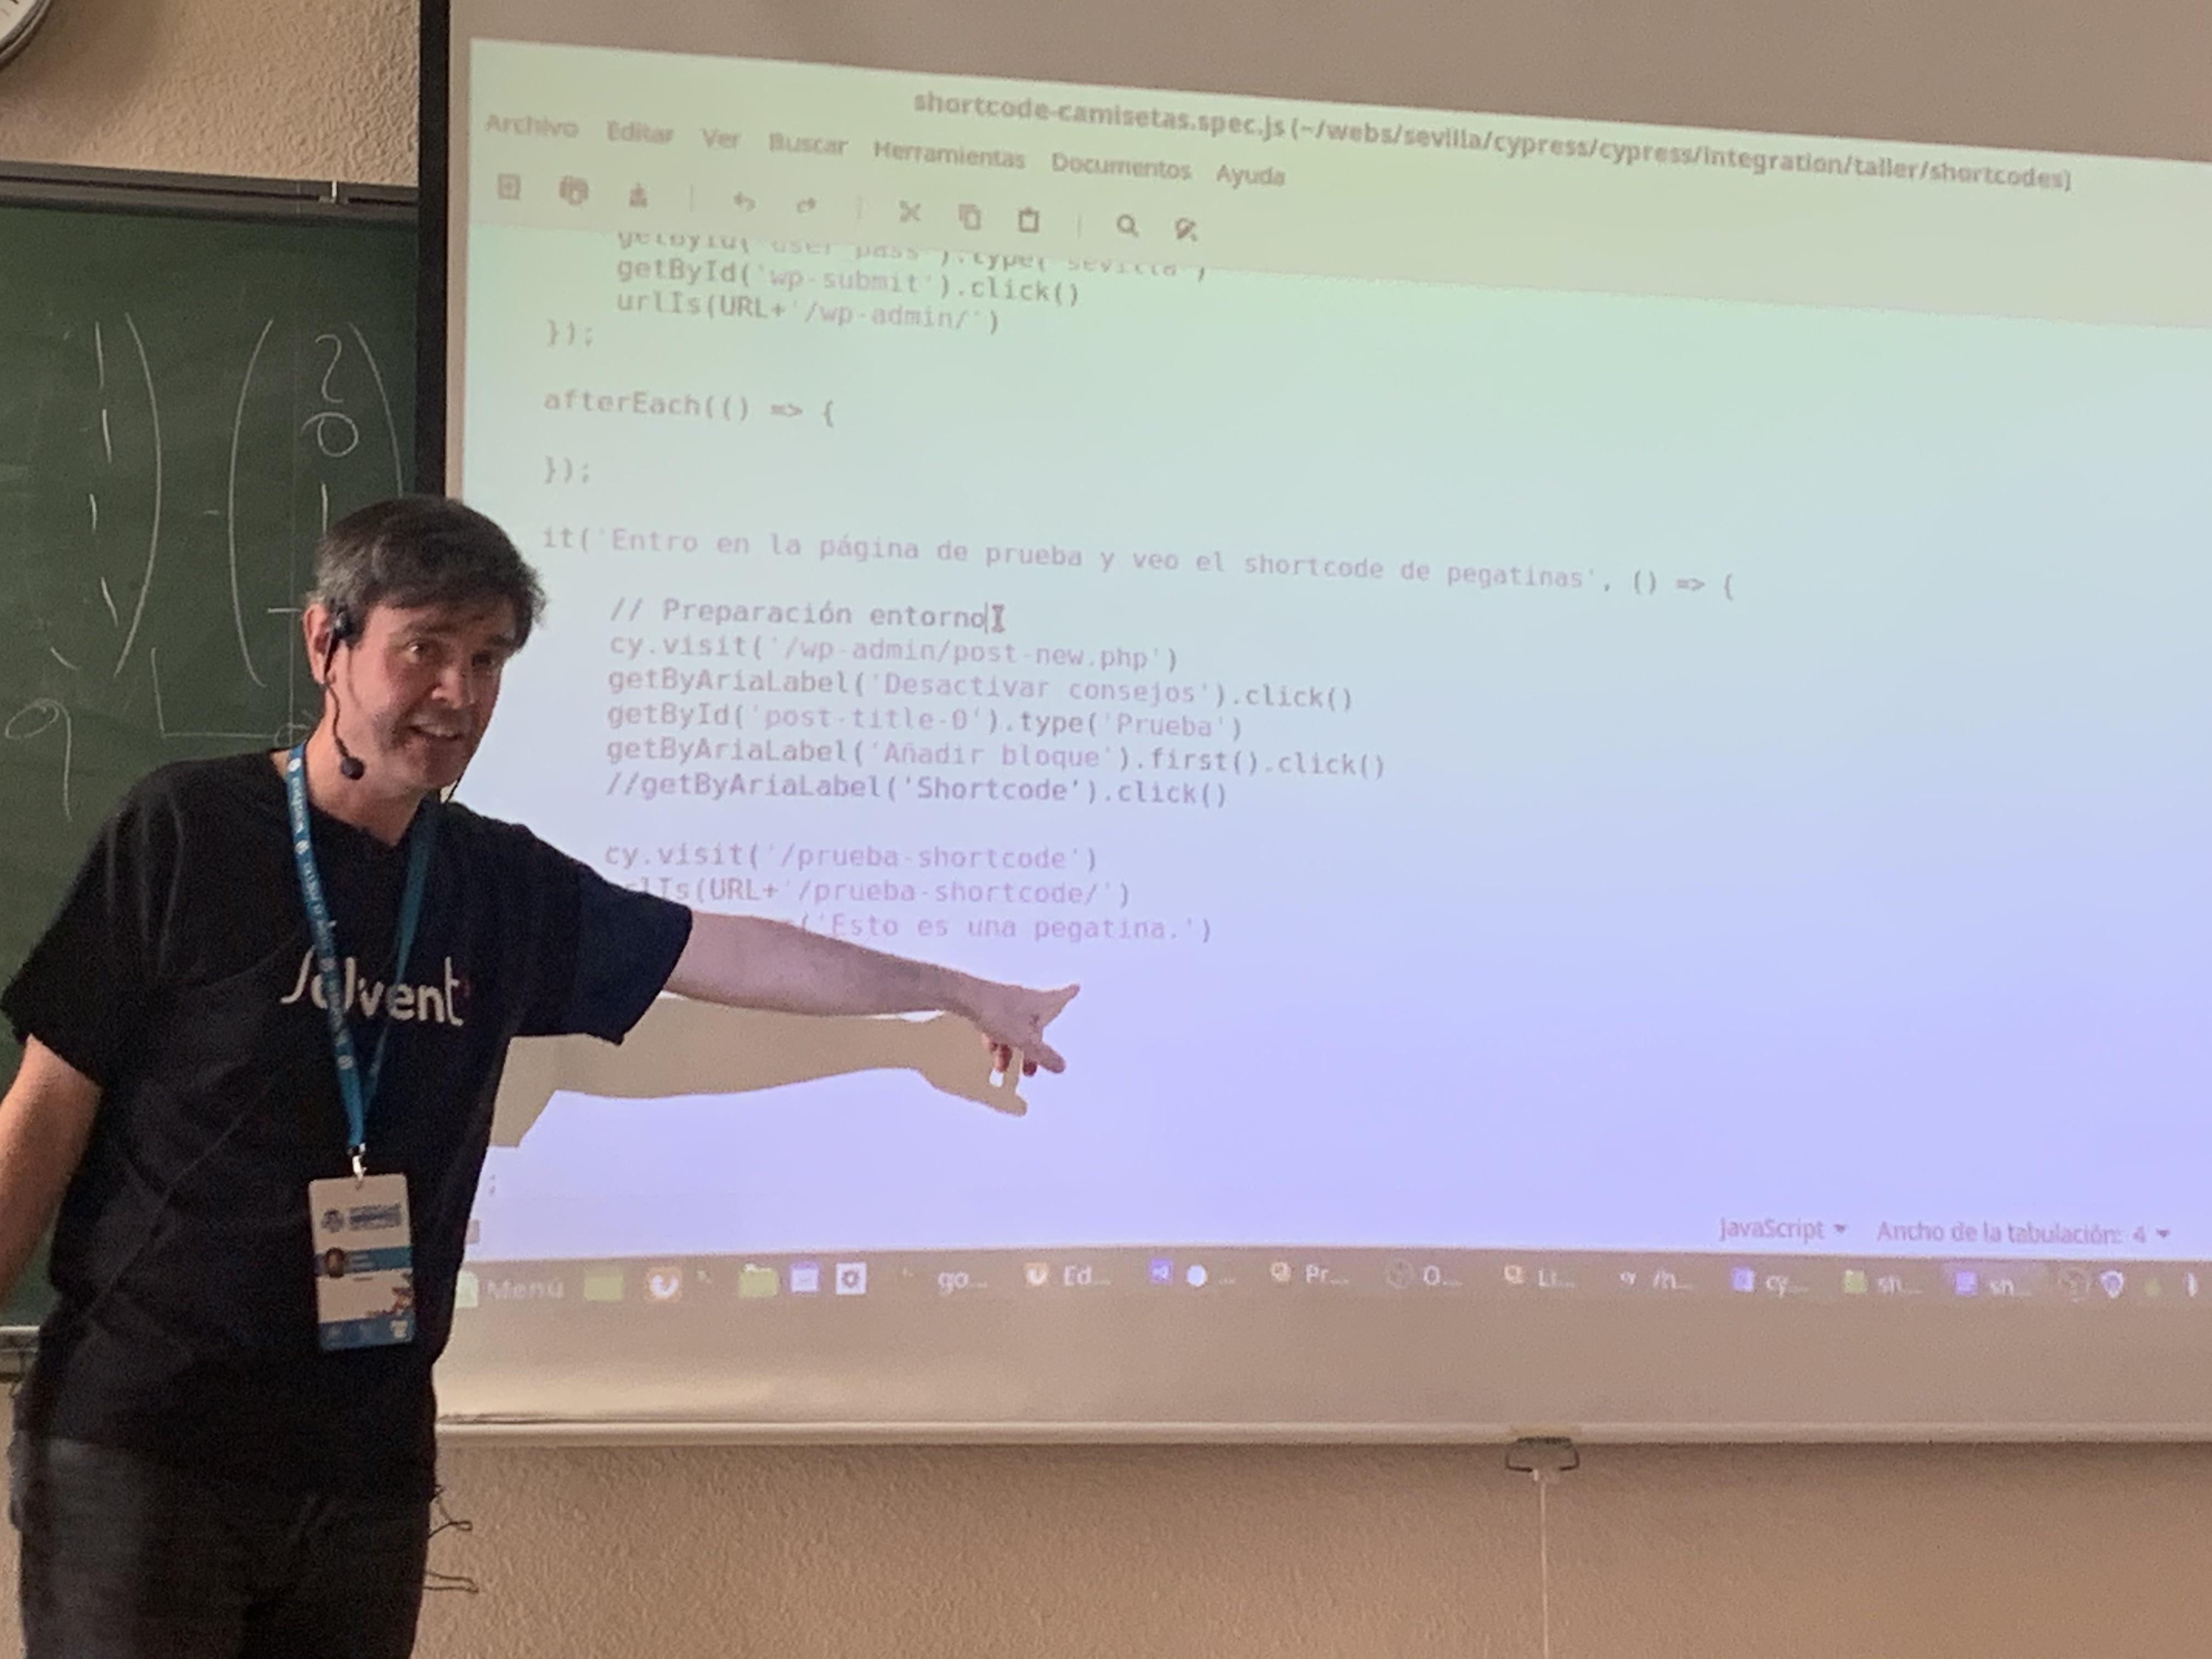 WordCamp Sevilla para desarrolladores – Día 1 Talleres